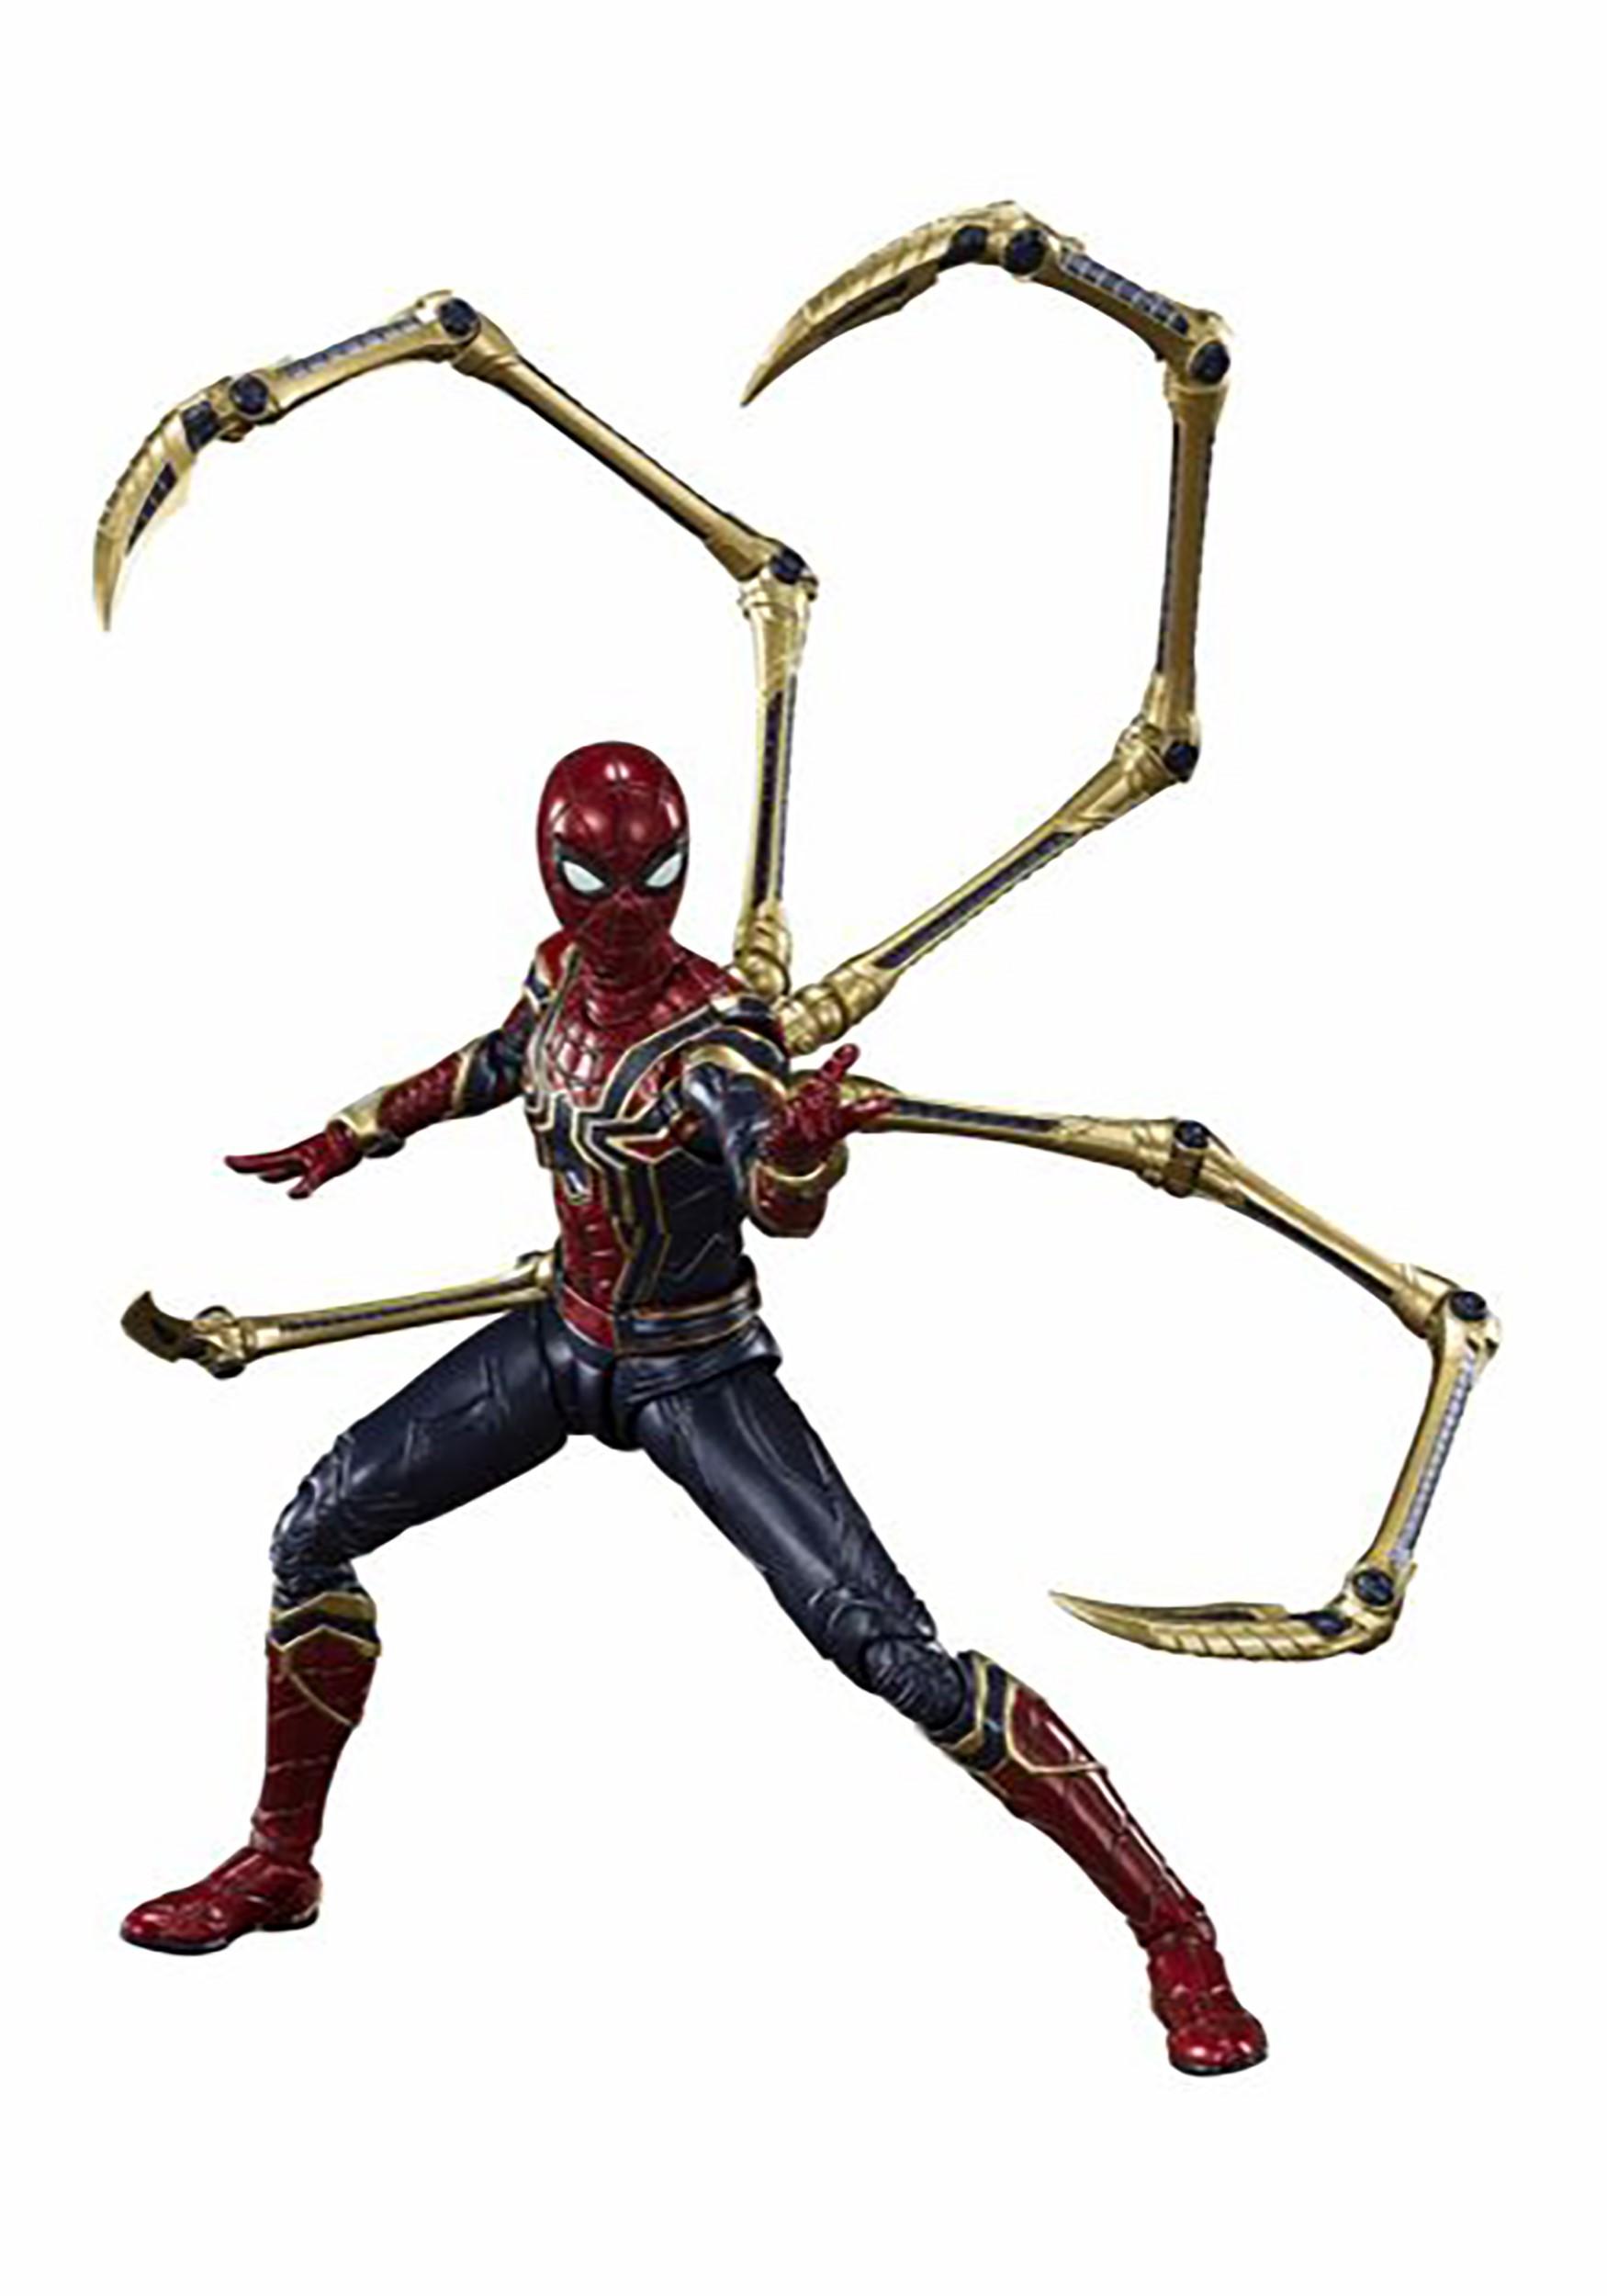 Avengers: Endgame Iron Spider Final Battle Edition SH Figuarts